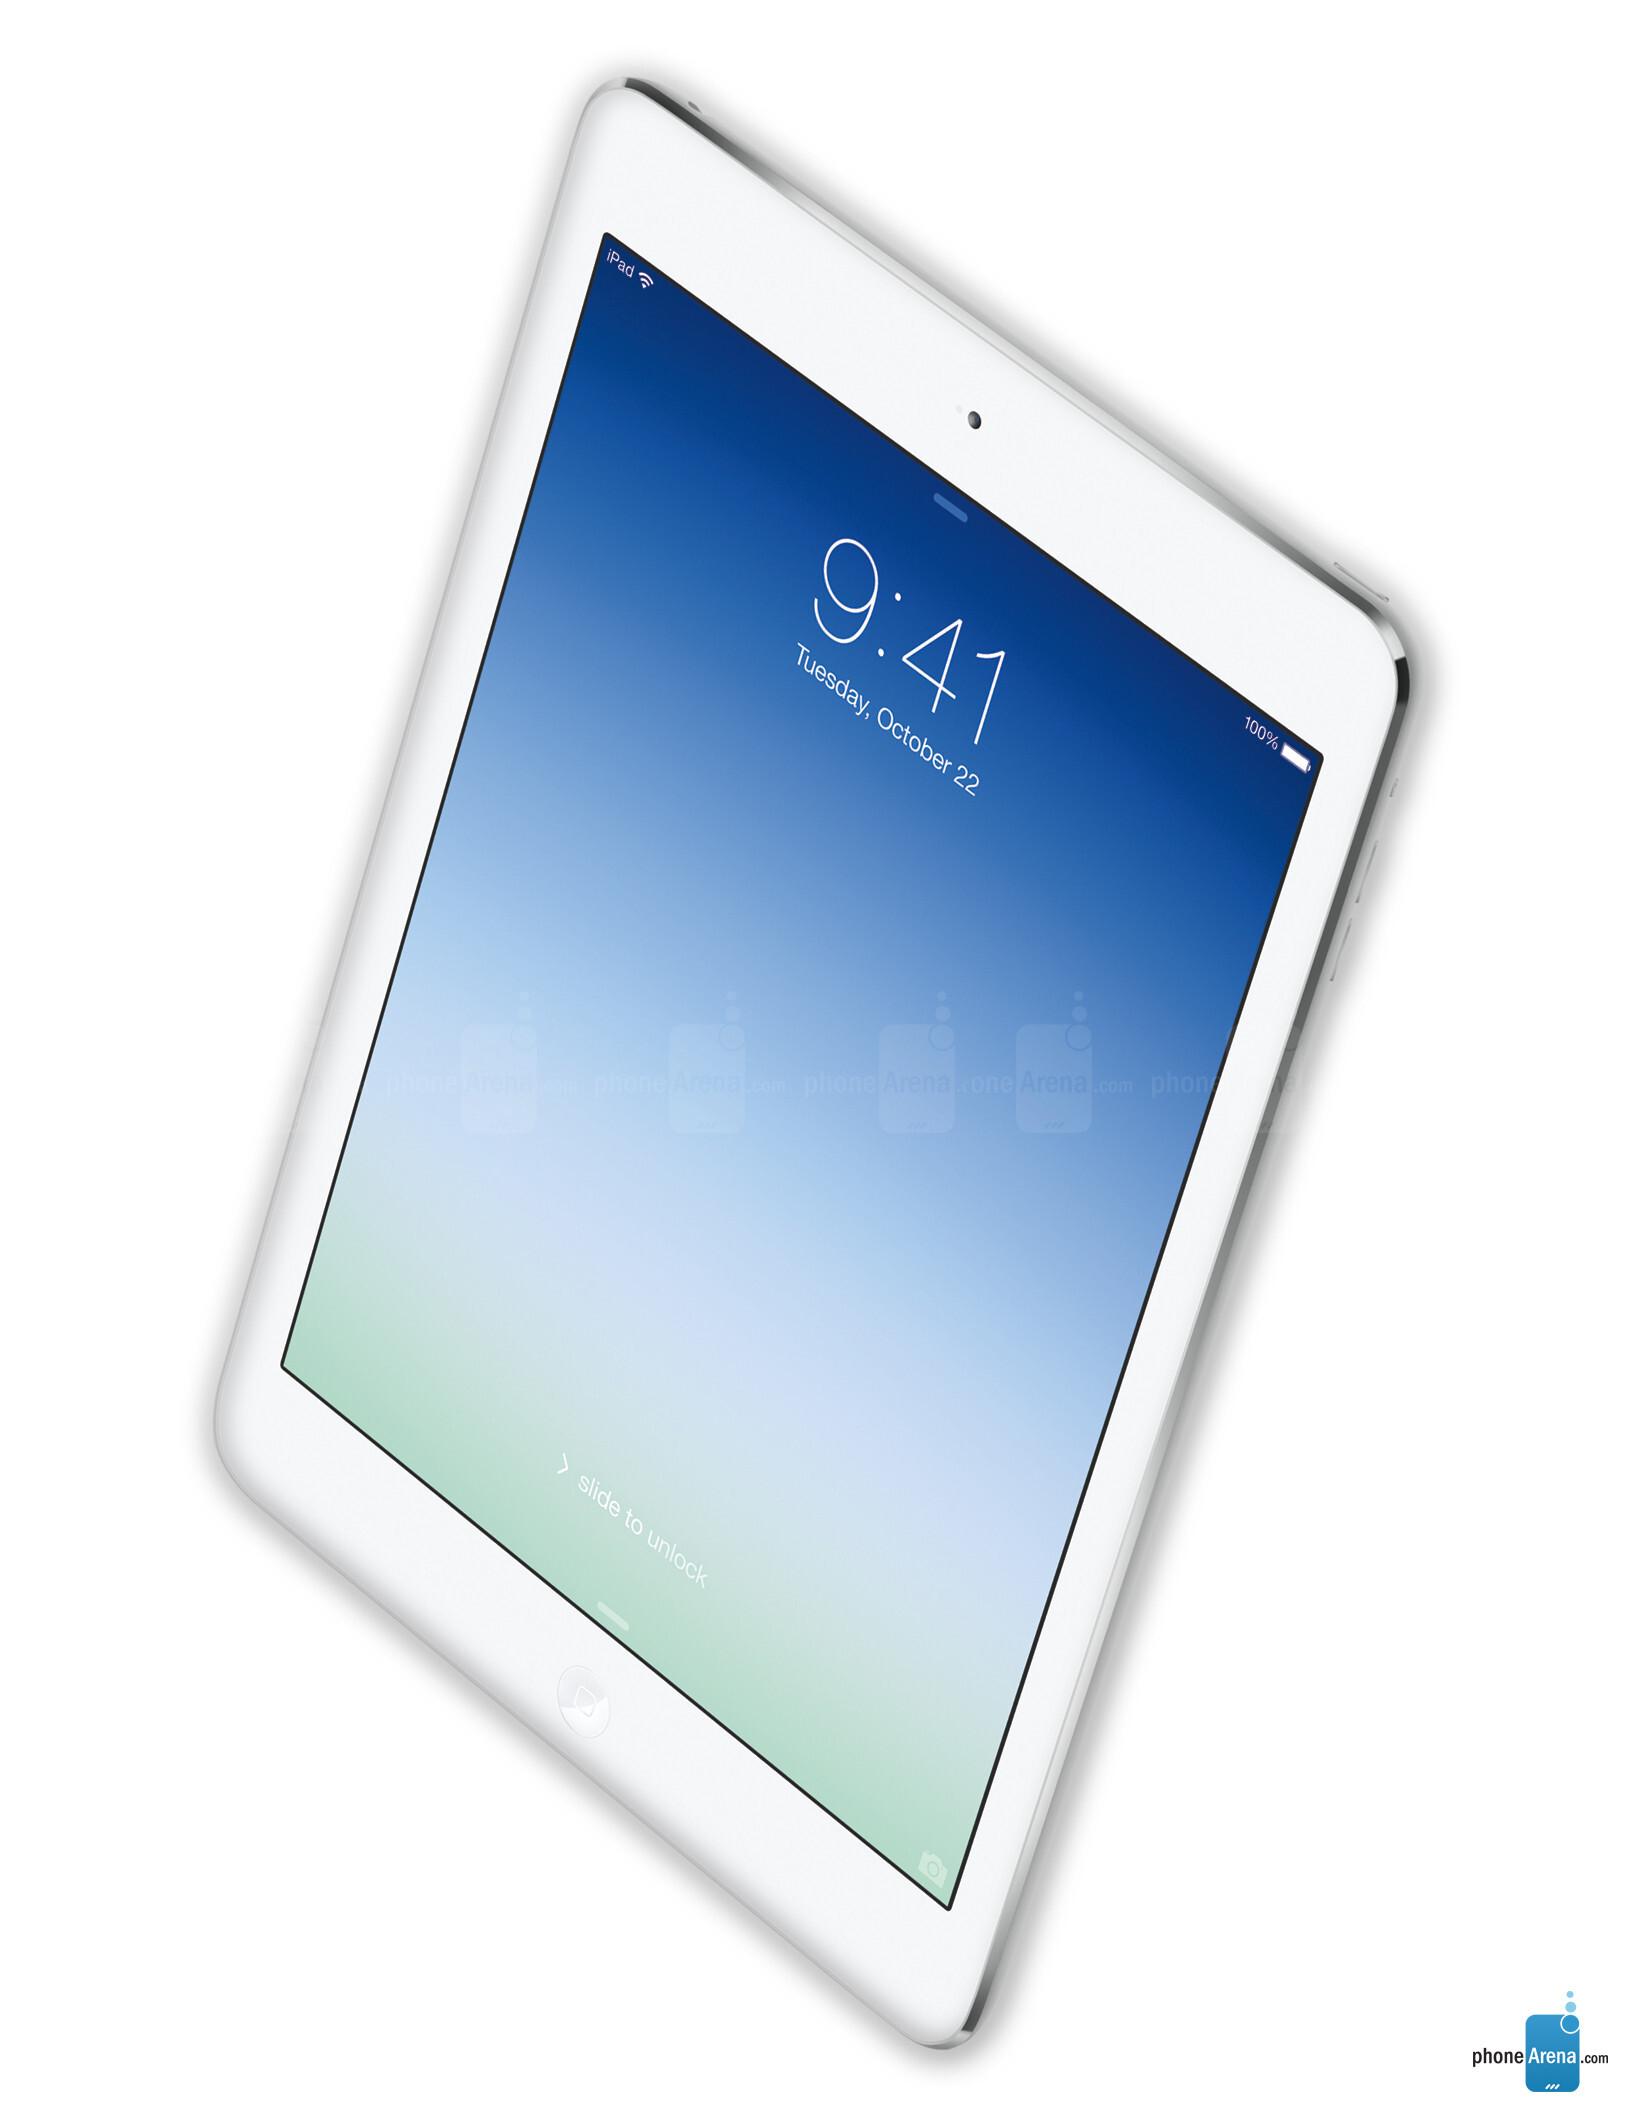 Apple Ipad Air 2 Background Apple Ipad Air · View All